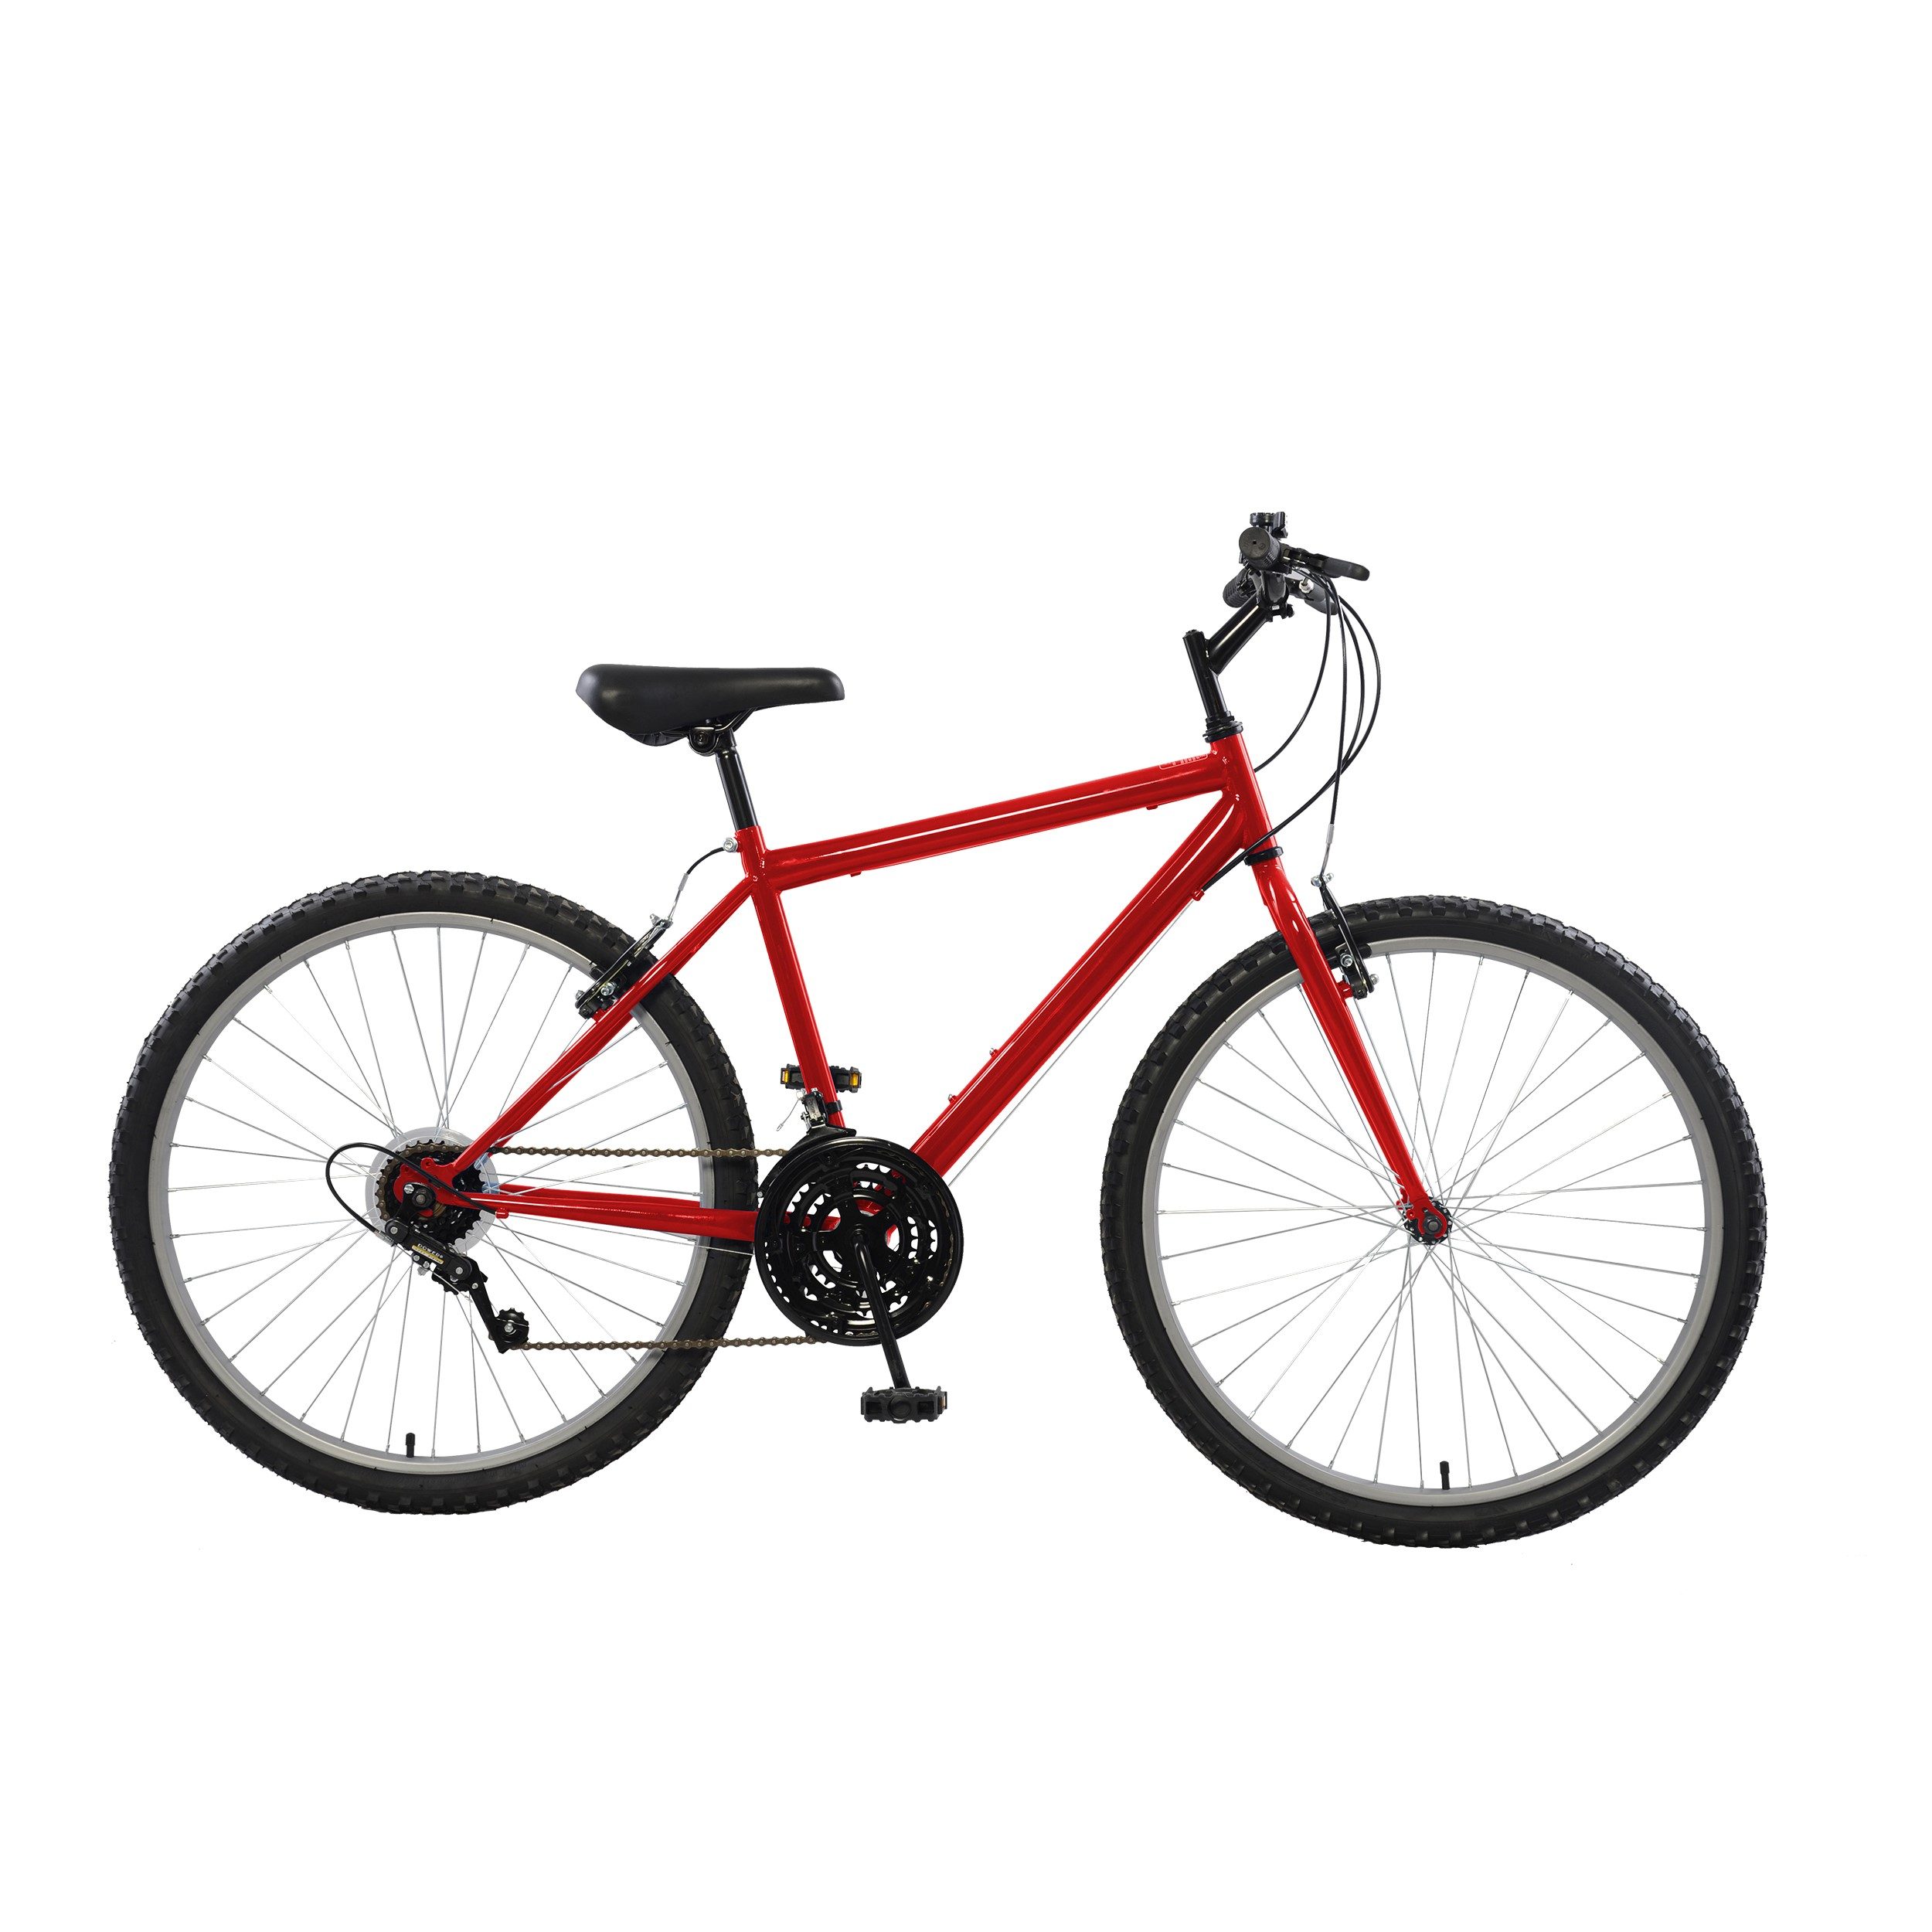 Cycle Force Rigid Mountain Bike 26 In Wheels 18 In Frame